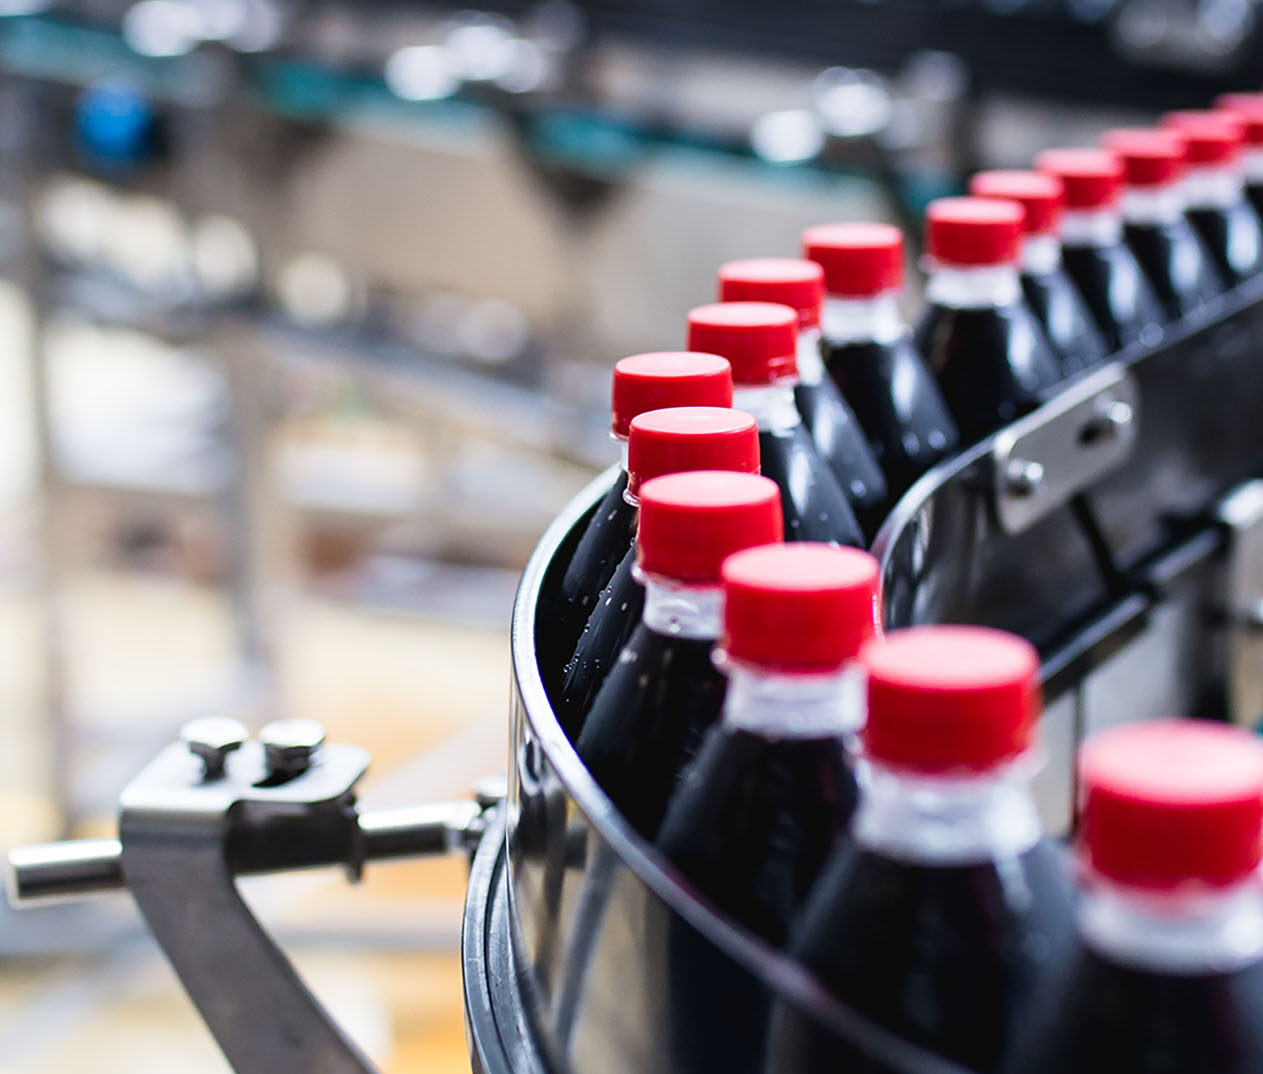 Limino OEE Enhancement image of beverage bottles in bottling plant